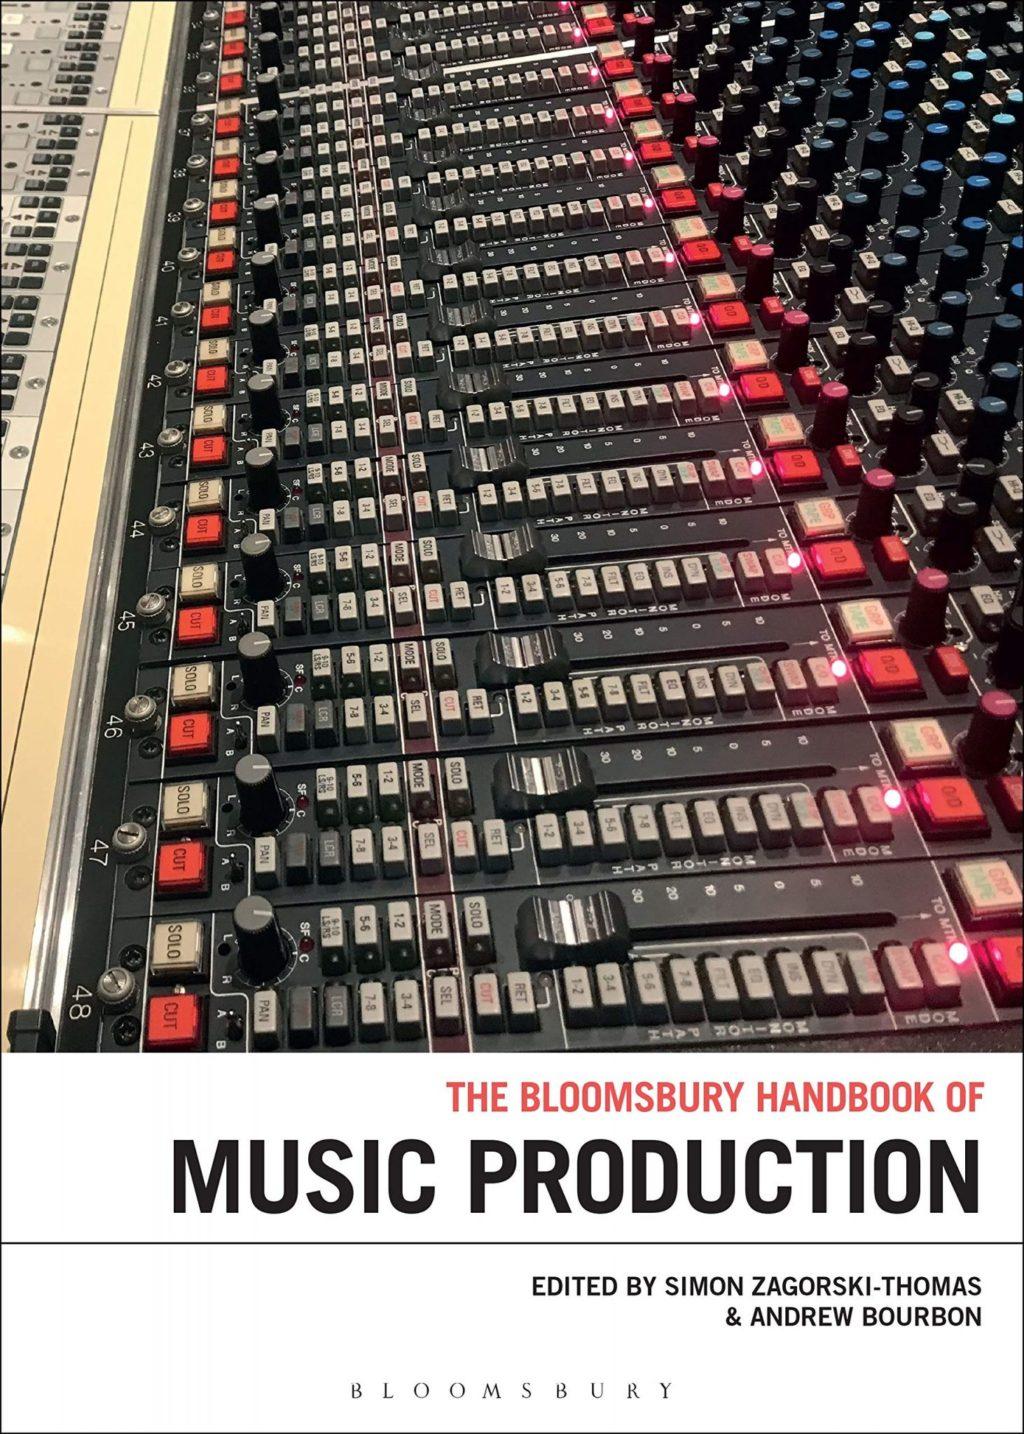 The Bloomsbury Handbook of Music Production (Bloomsbury Handbooks)